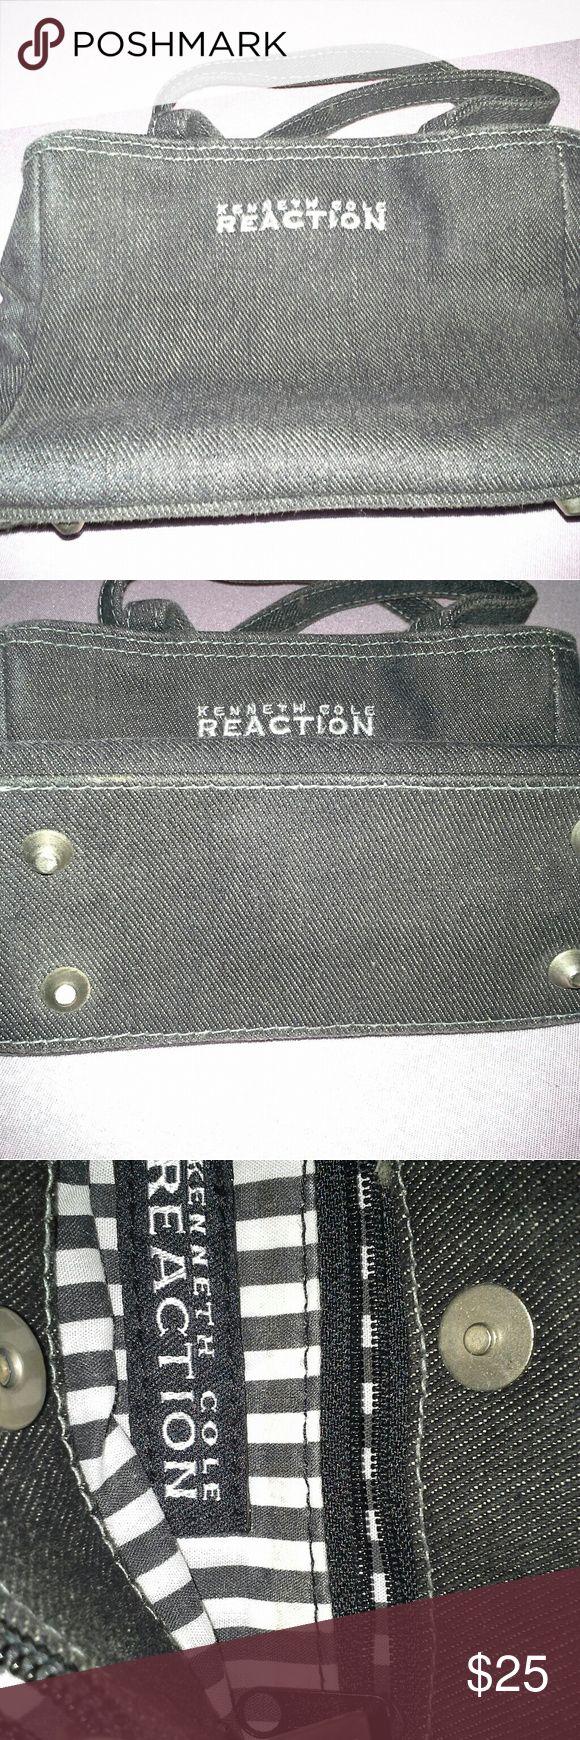 "Kenneth Cole Reaction Mini Handbag Small canvas handbag 7.5""L x 5""W.  Two zipper pockets on inside with magnetic closure Kenneth Cole Reaction Bags Mini Bags"